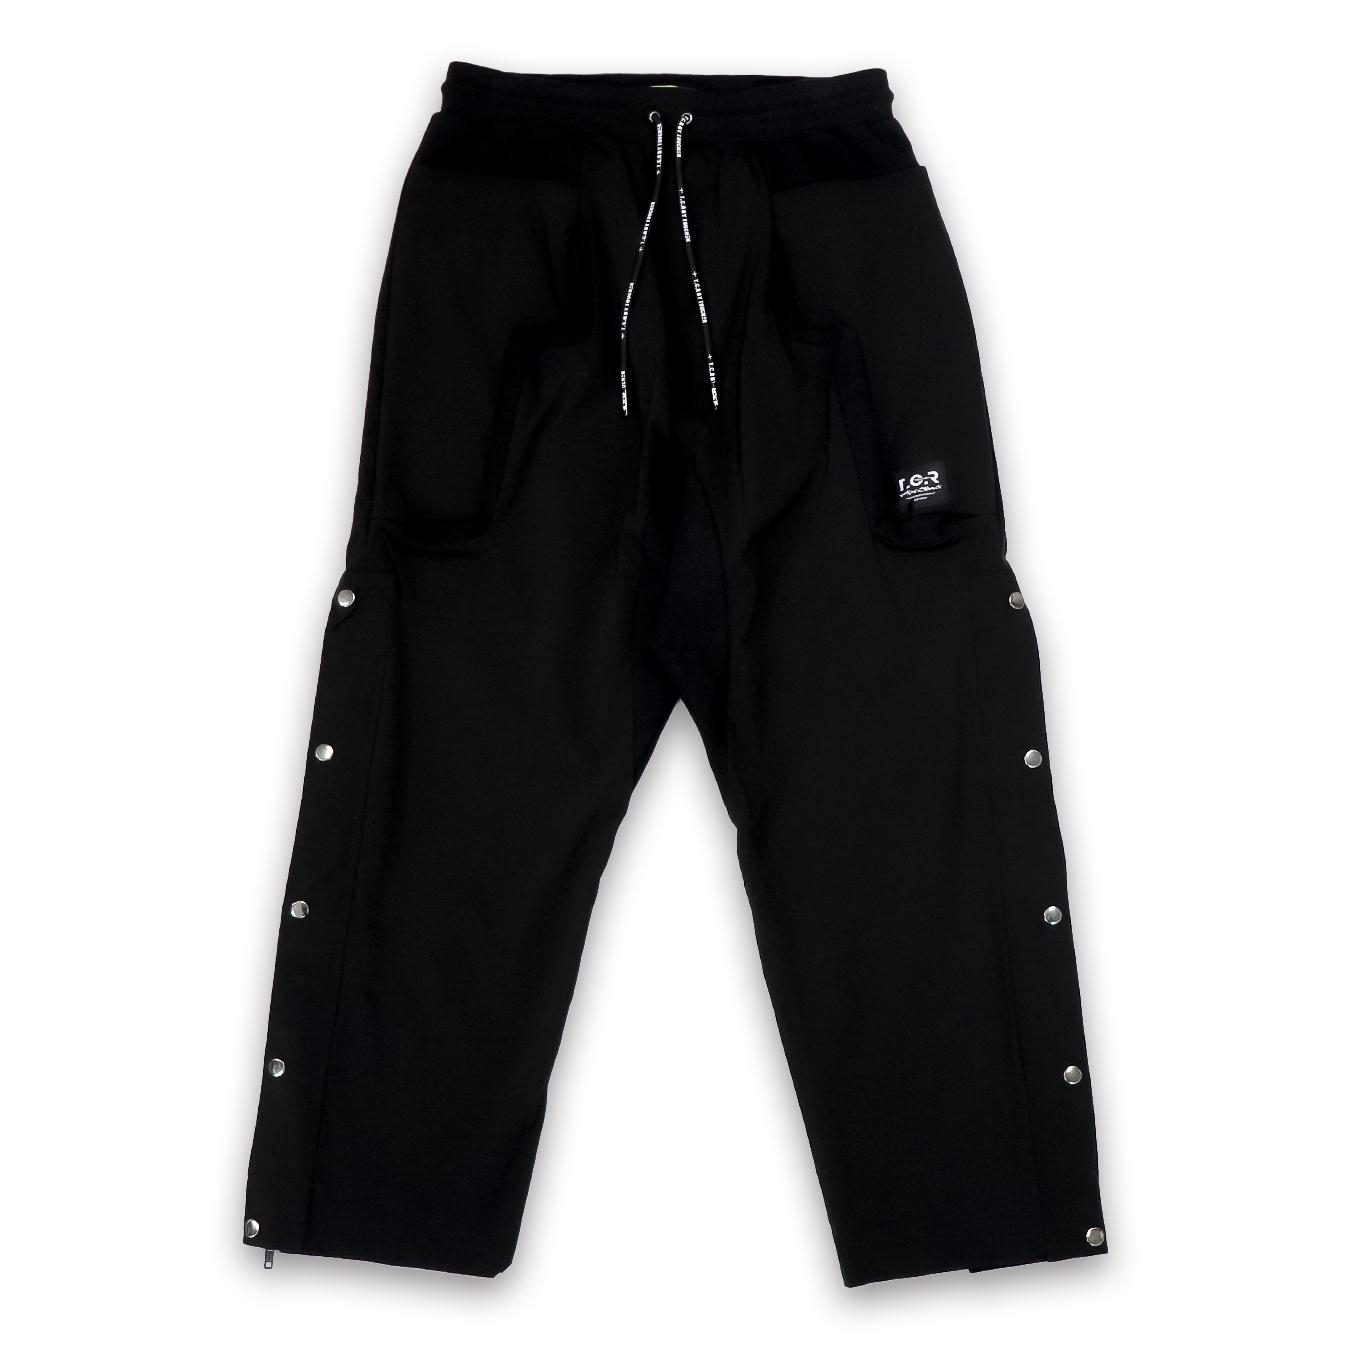 T.C.R EQUIPMENT SHELL PANTS V2 - BLACK